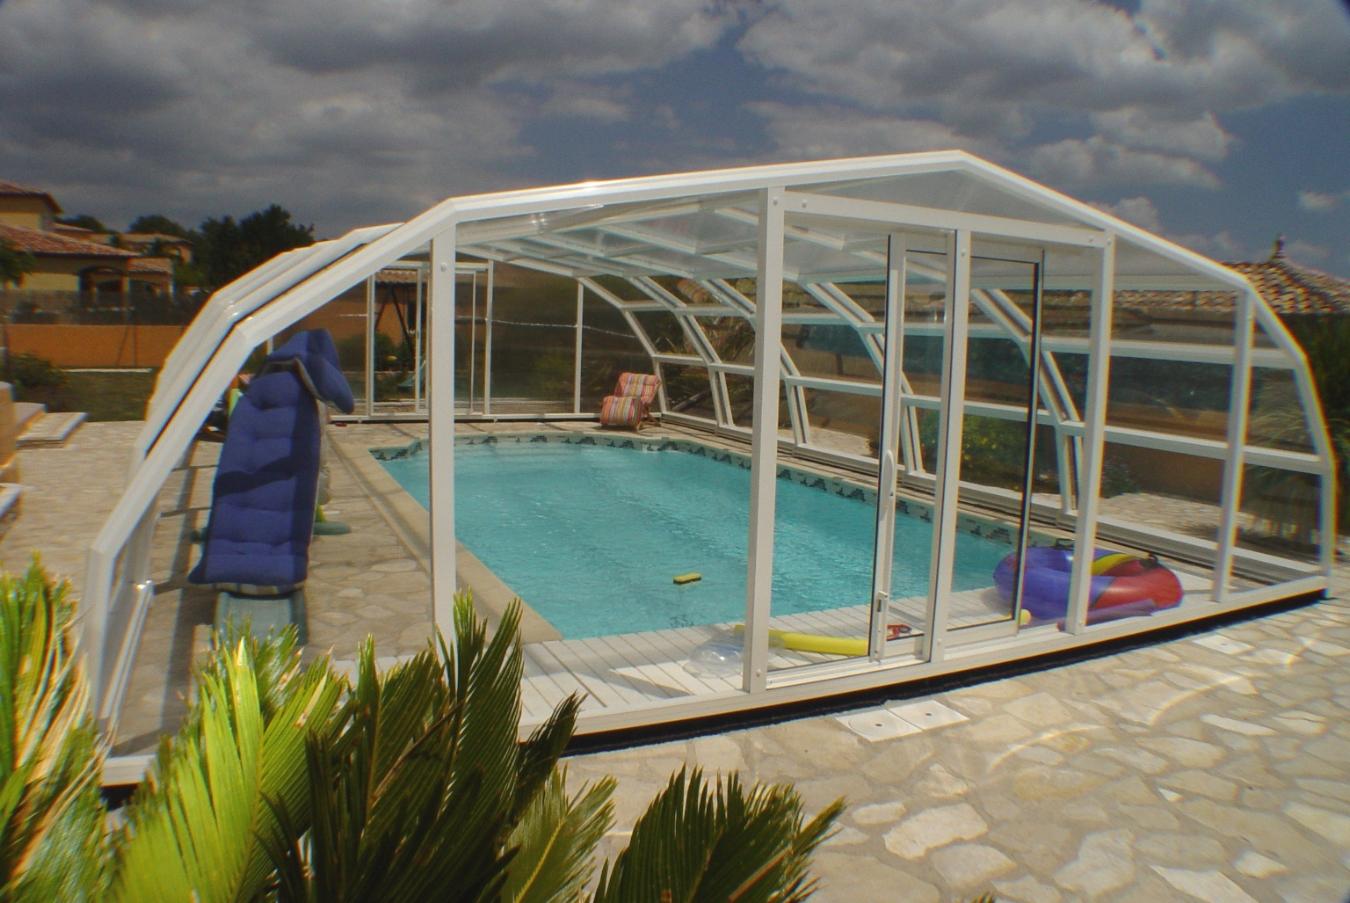 Abris piscine haut pacifique for Abris piscine eureka